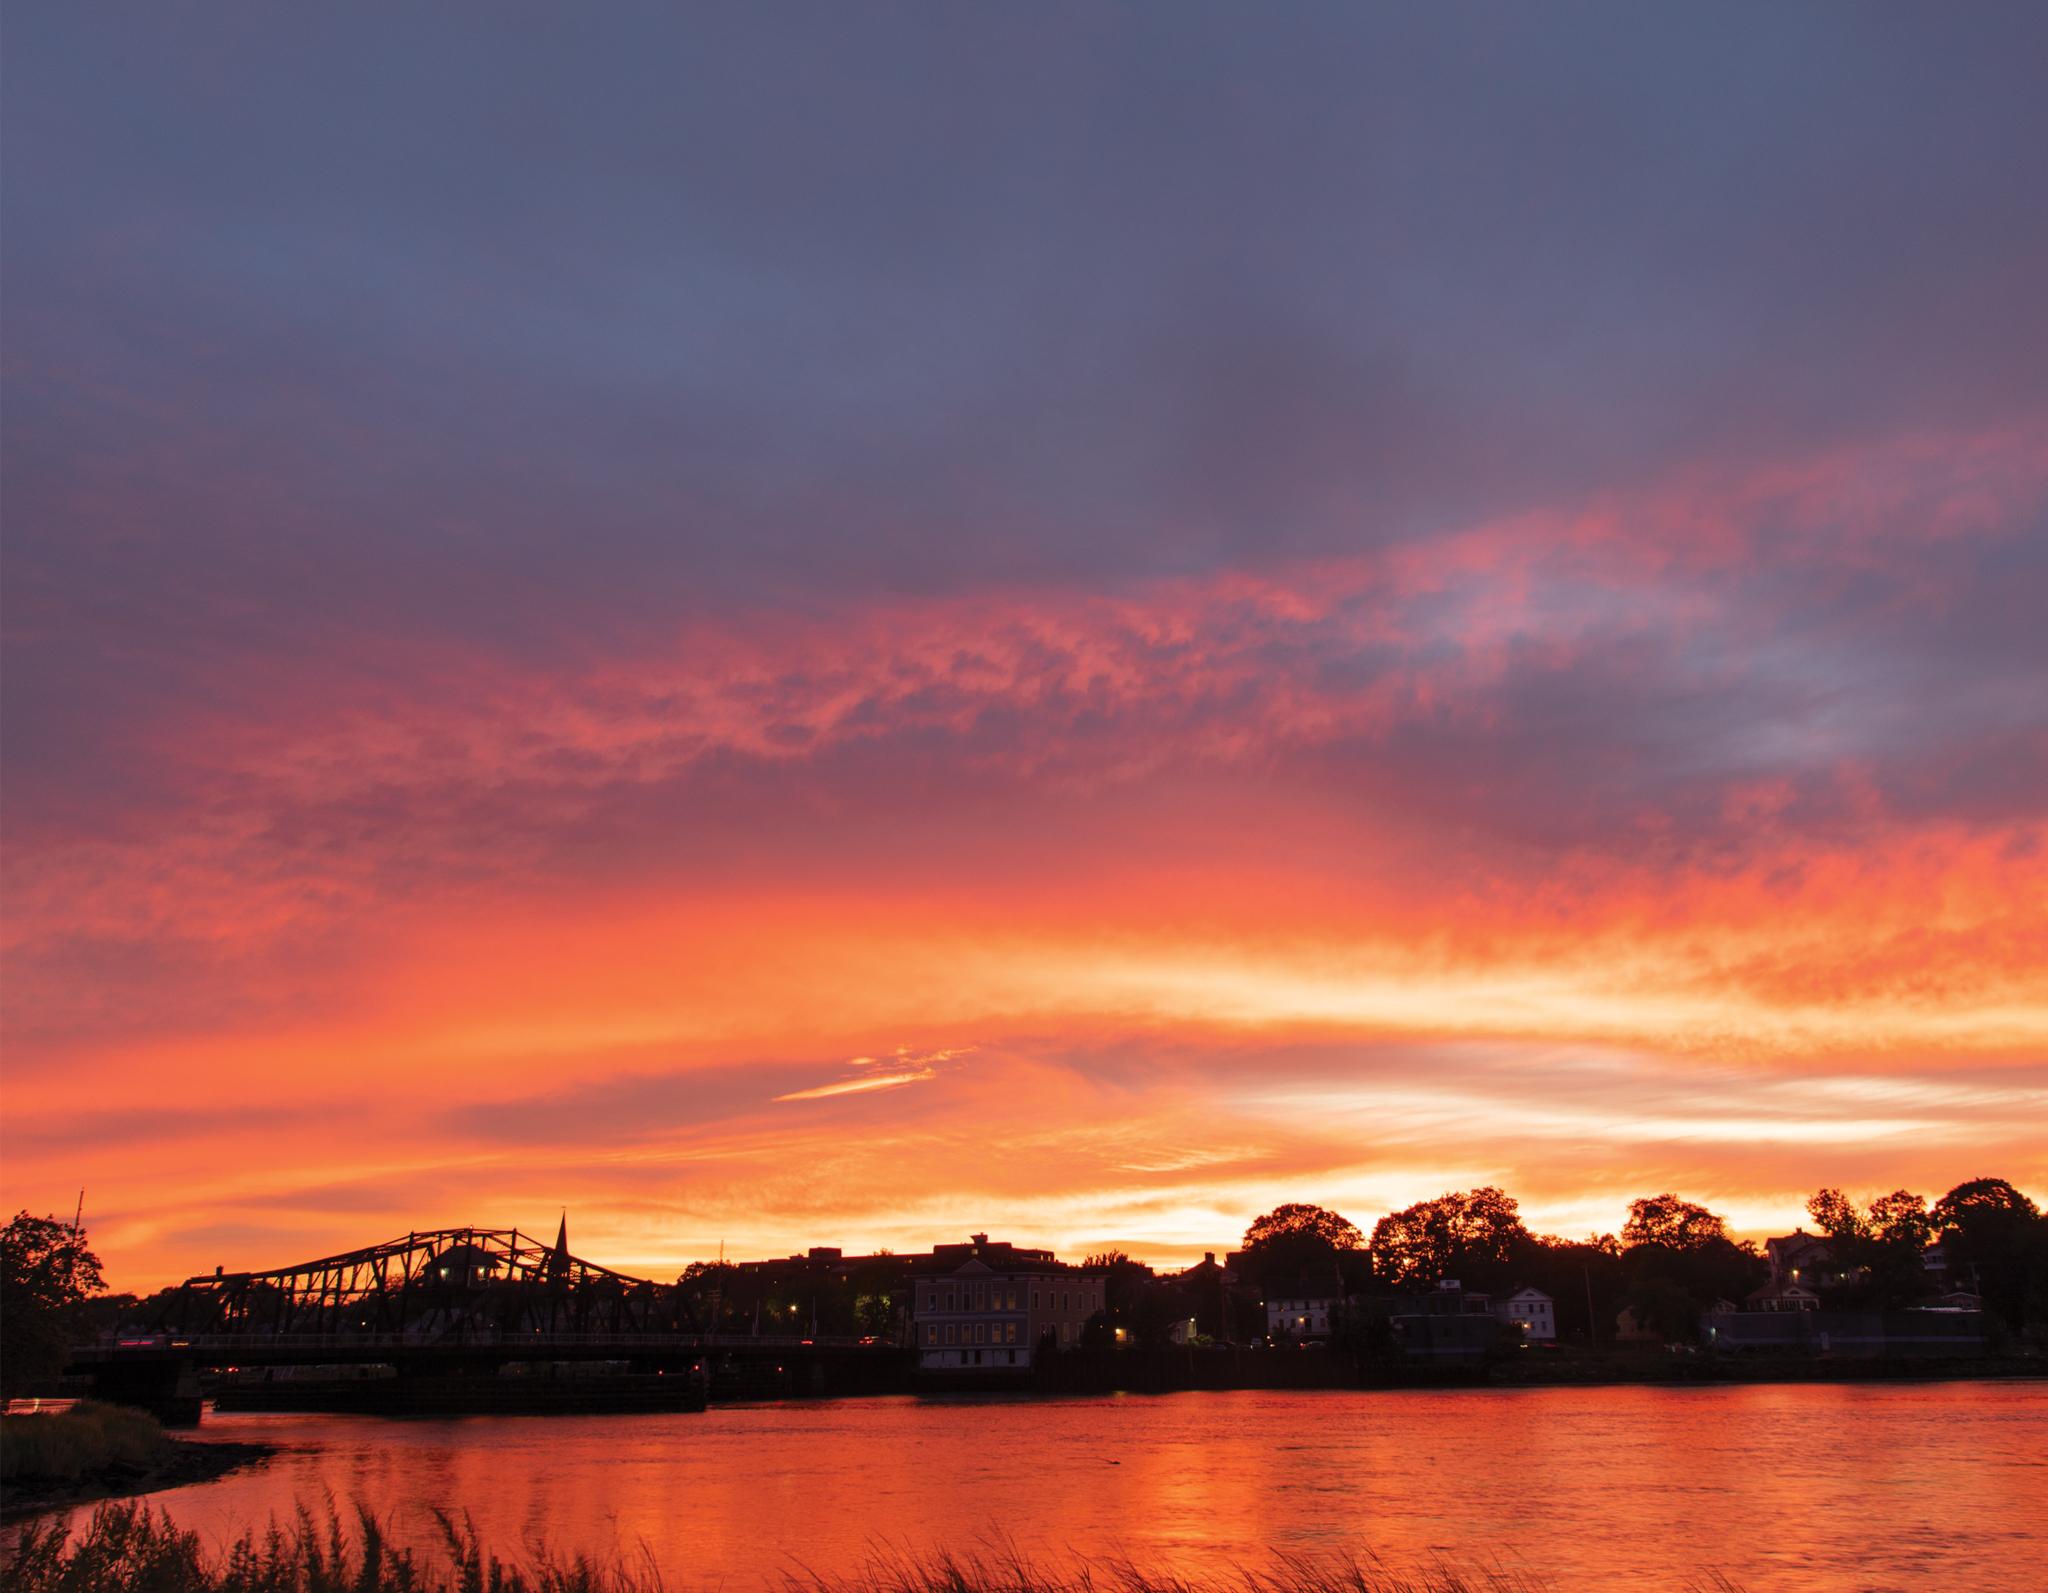 September: Quinnipiac River